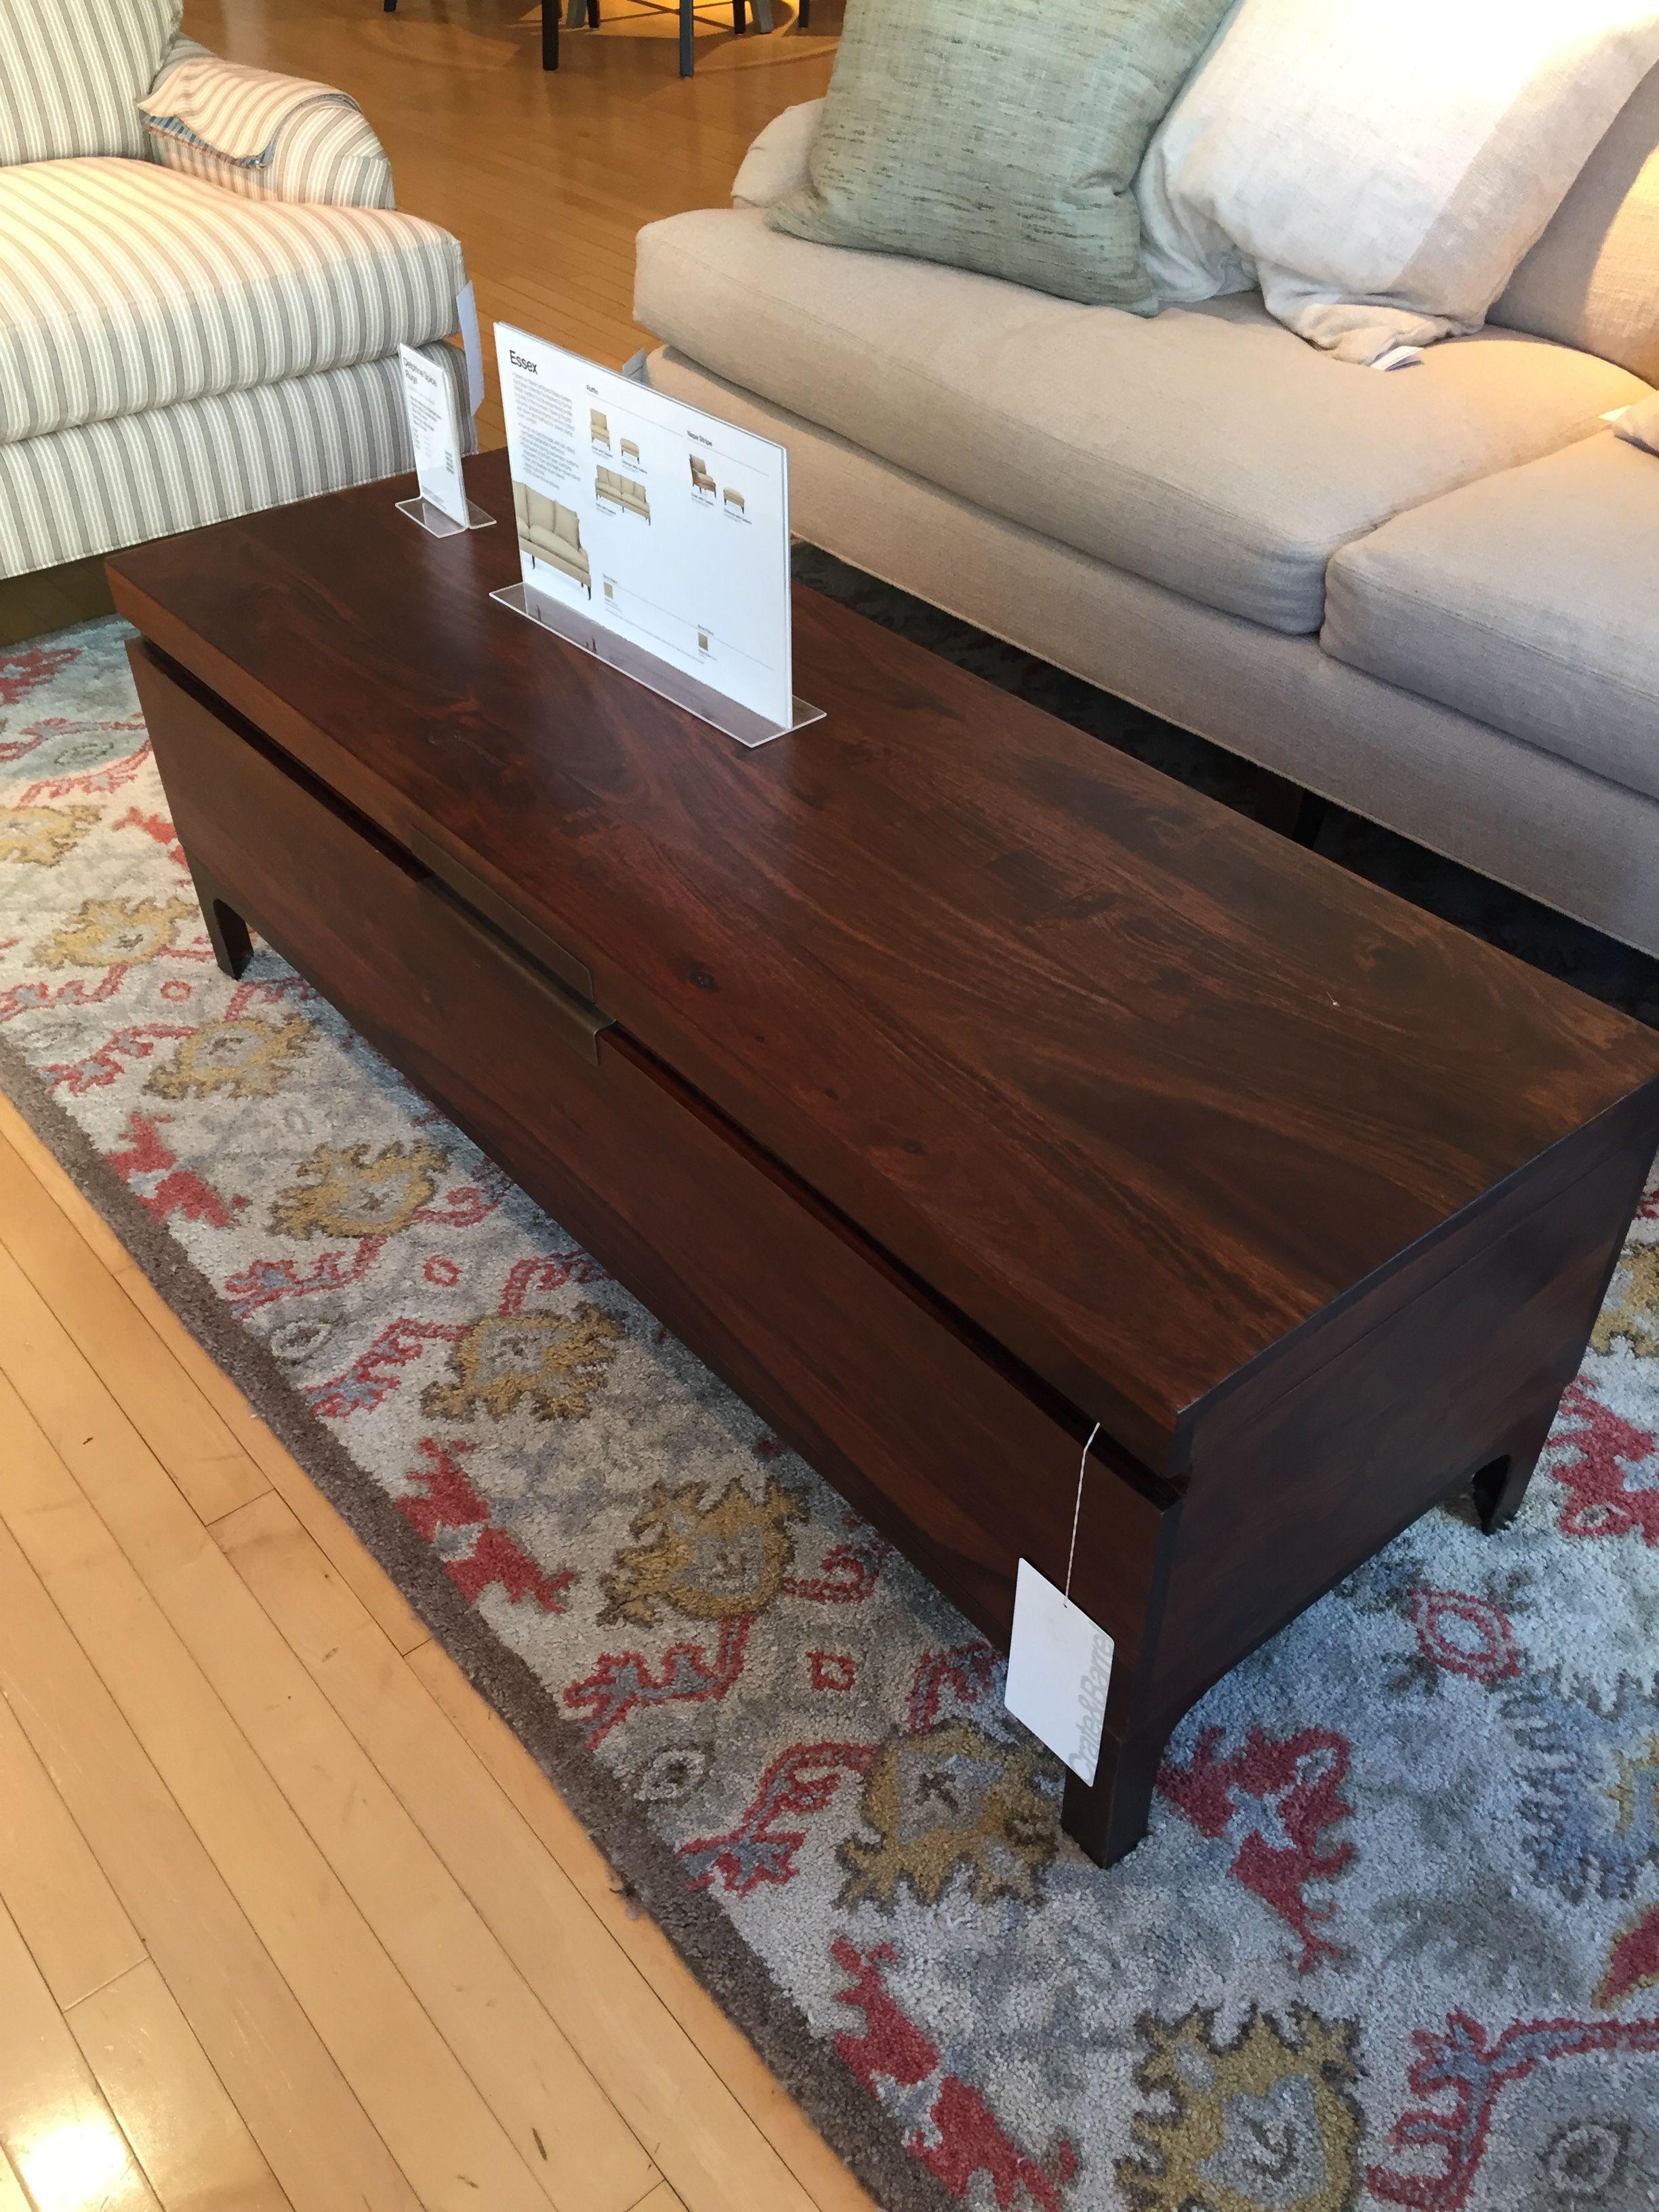 Crate and Barrel Jada Trunk Bench $549 51w x 18d x 17 75h